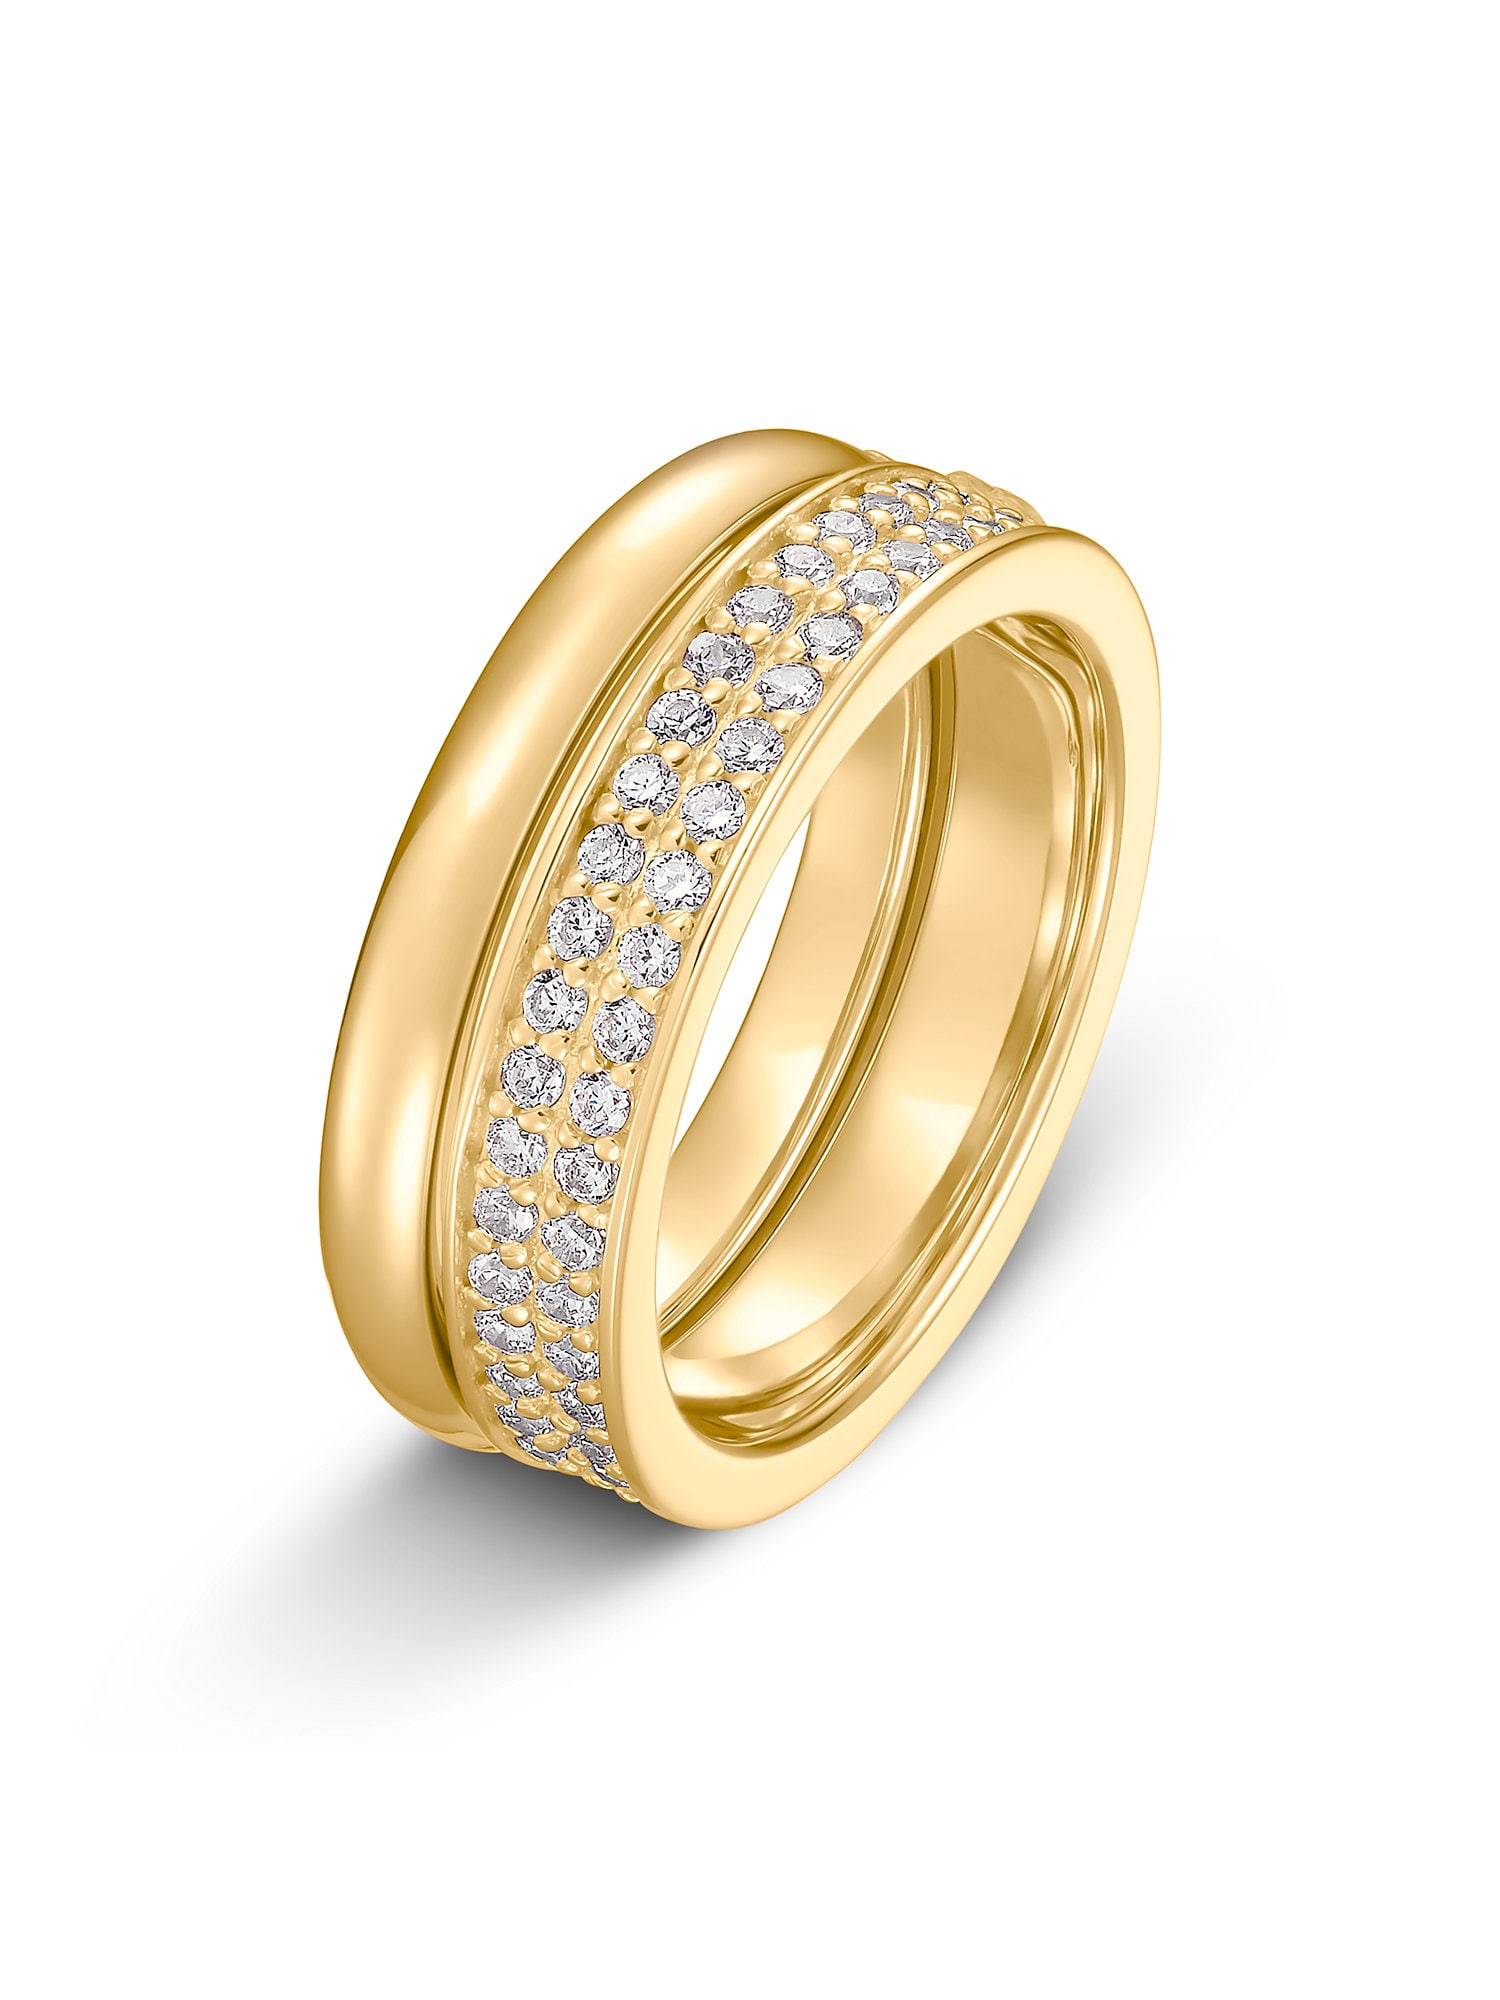 Damen JETTE Ring beige, gold, grau, weiß | 04040615356921